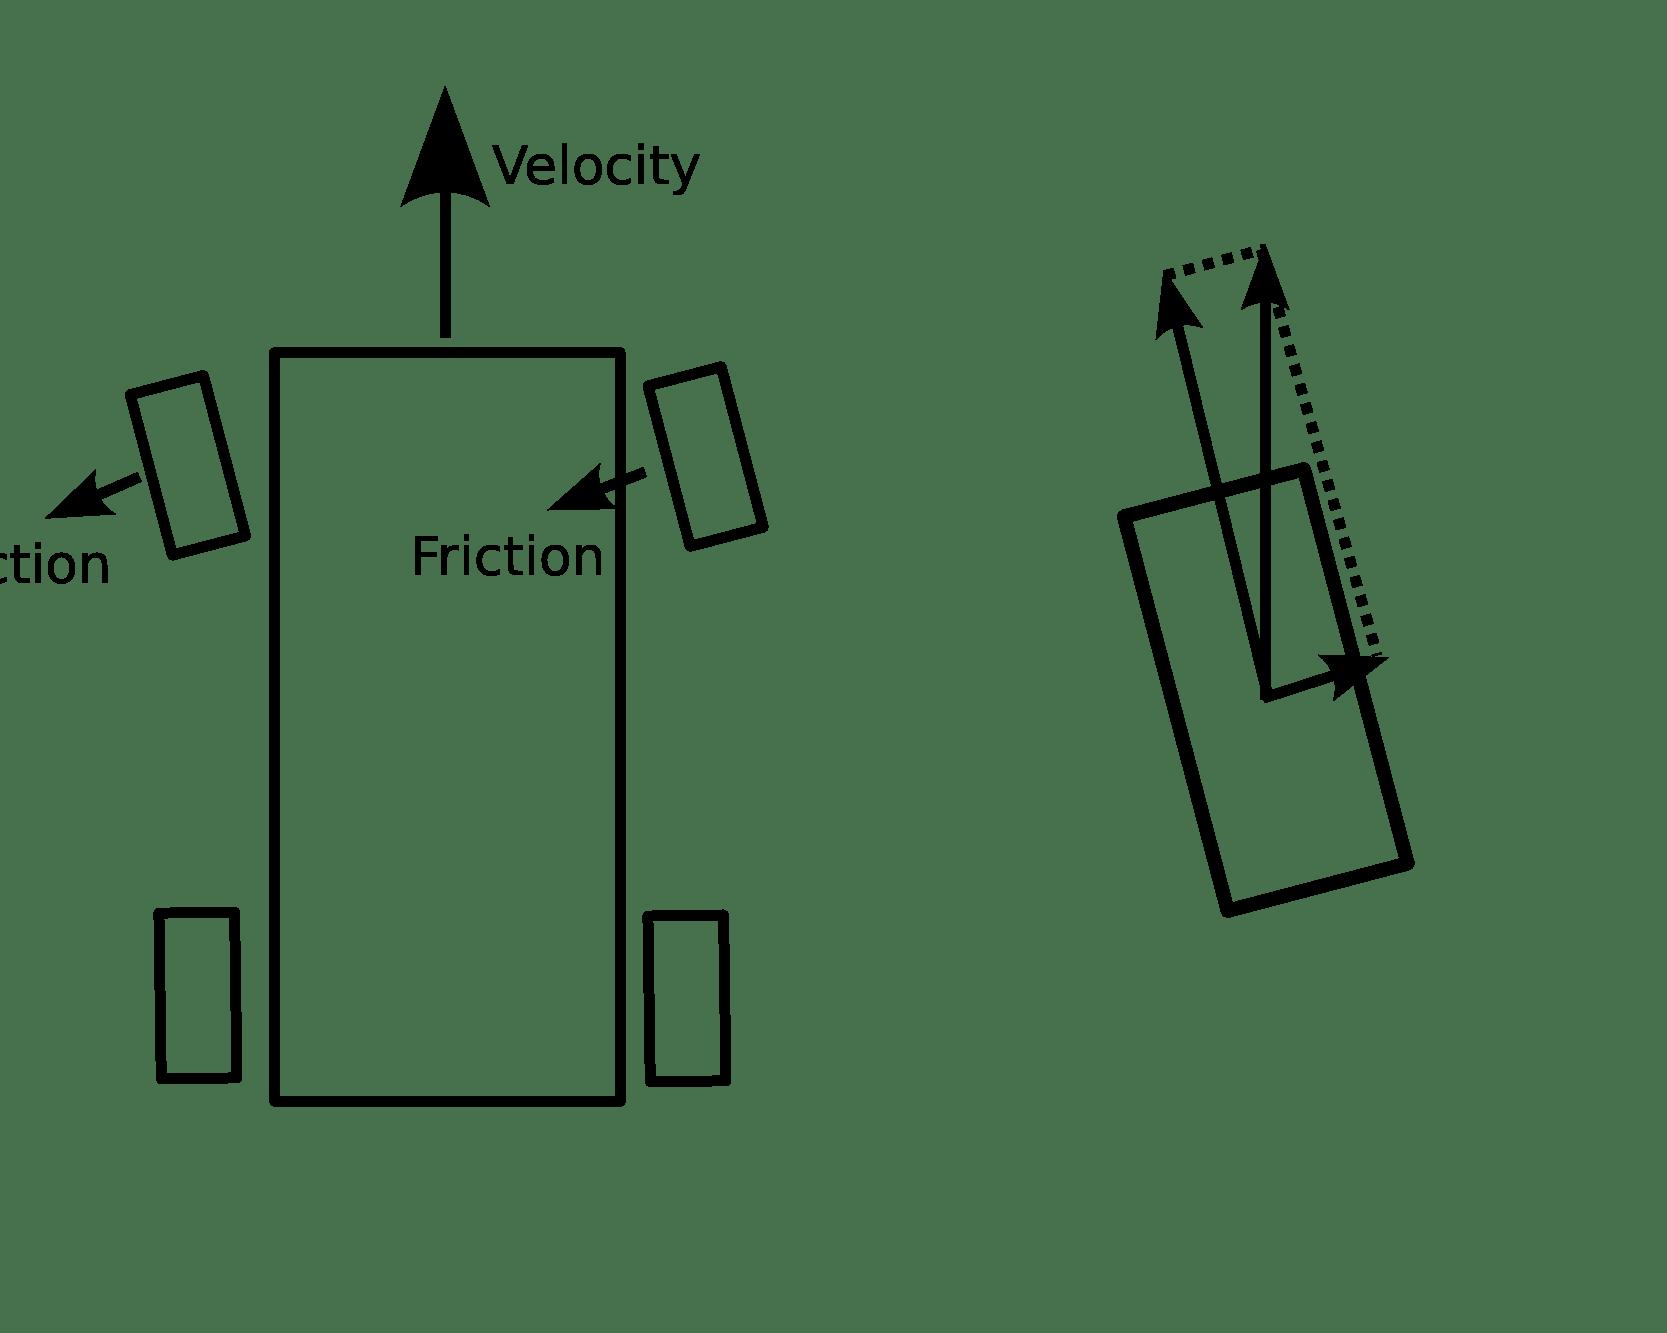 Car Motion Diagram Car Get Free Image About Wiring Diagram